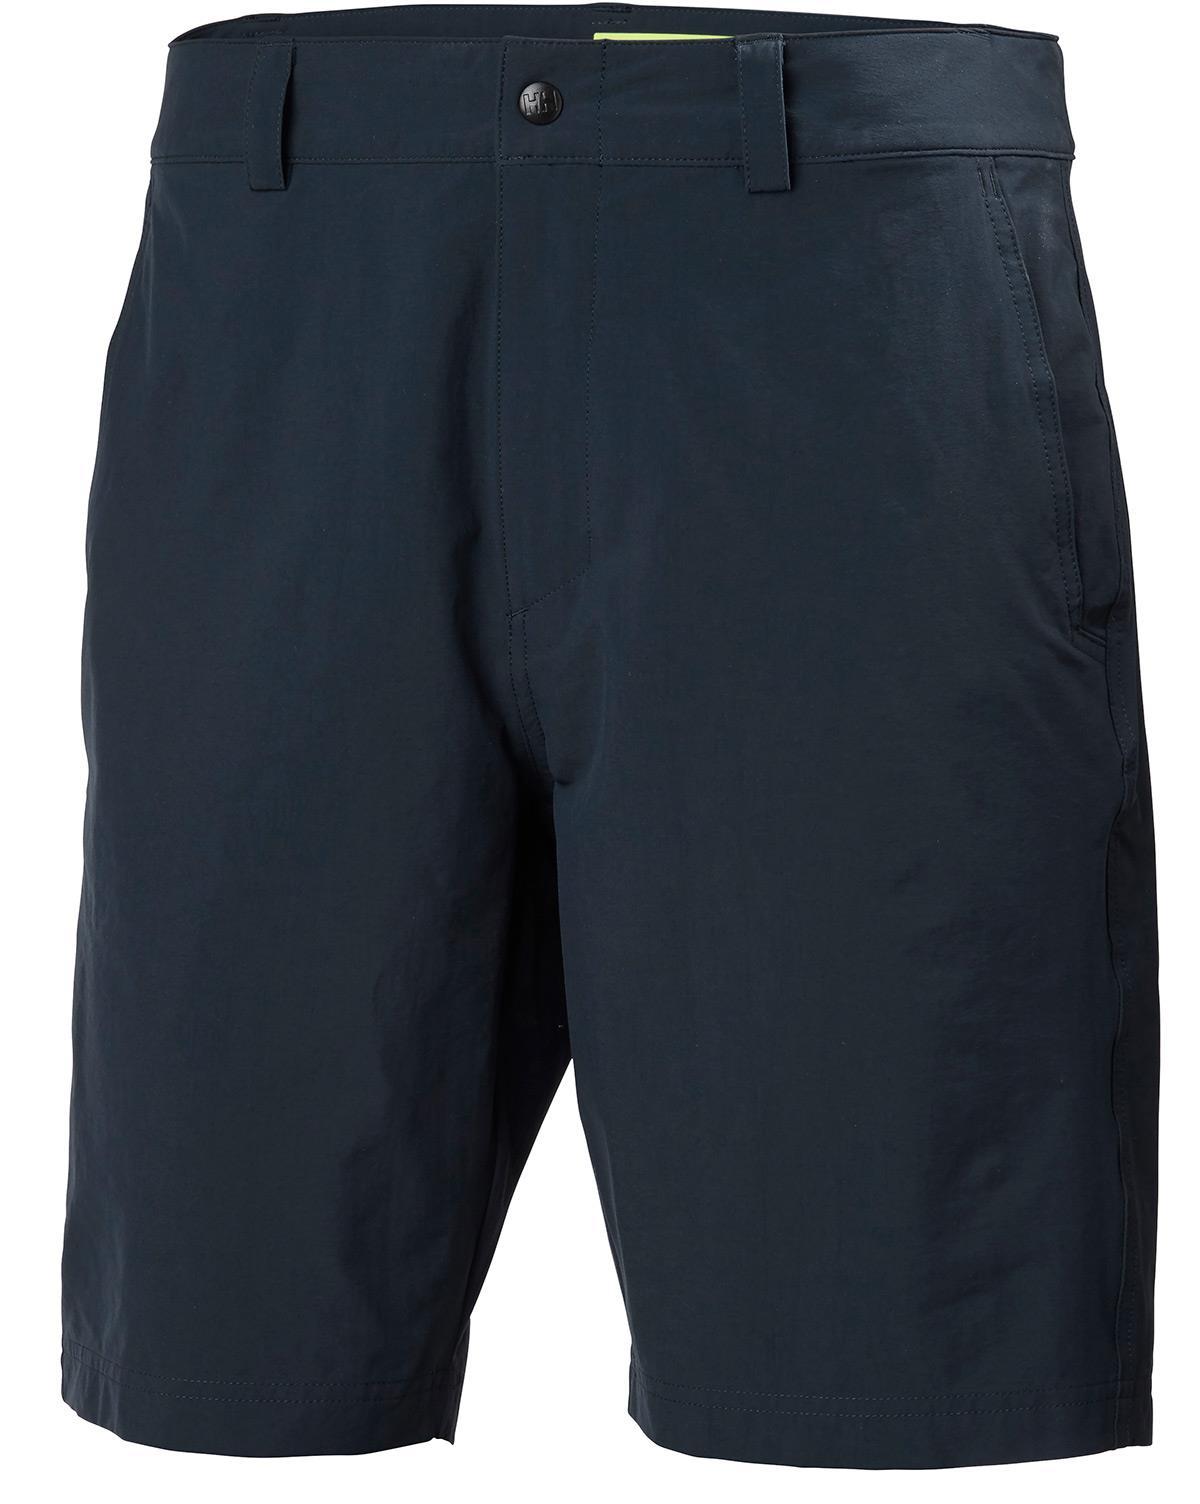 Helly Hansen Hh Hp Qd Club Shorts 10' Erkek Şort